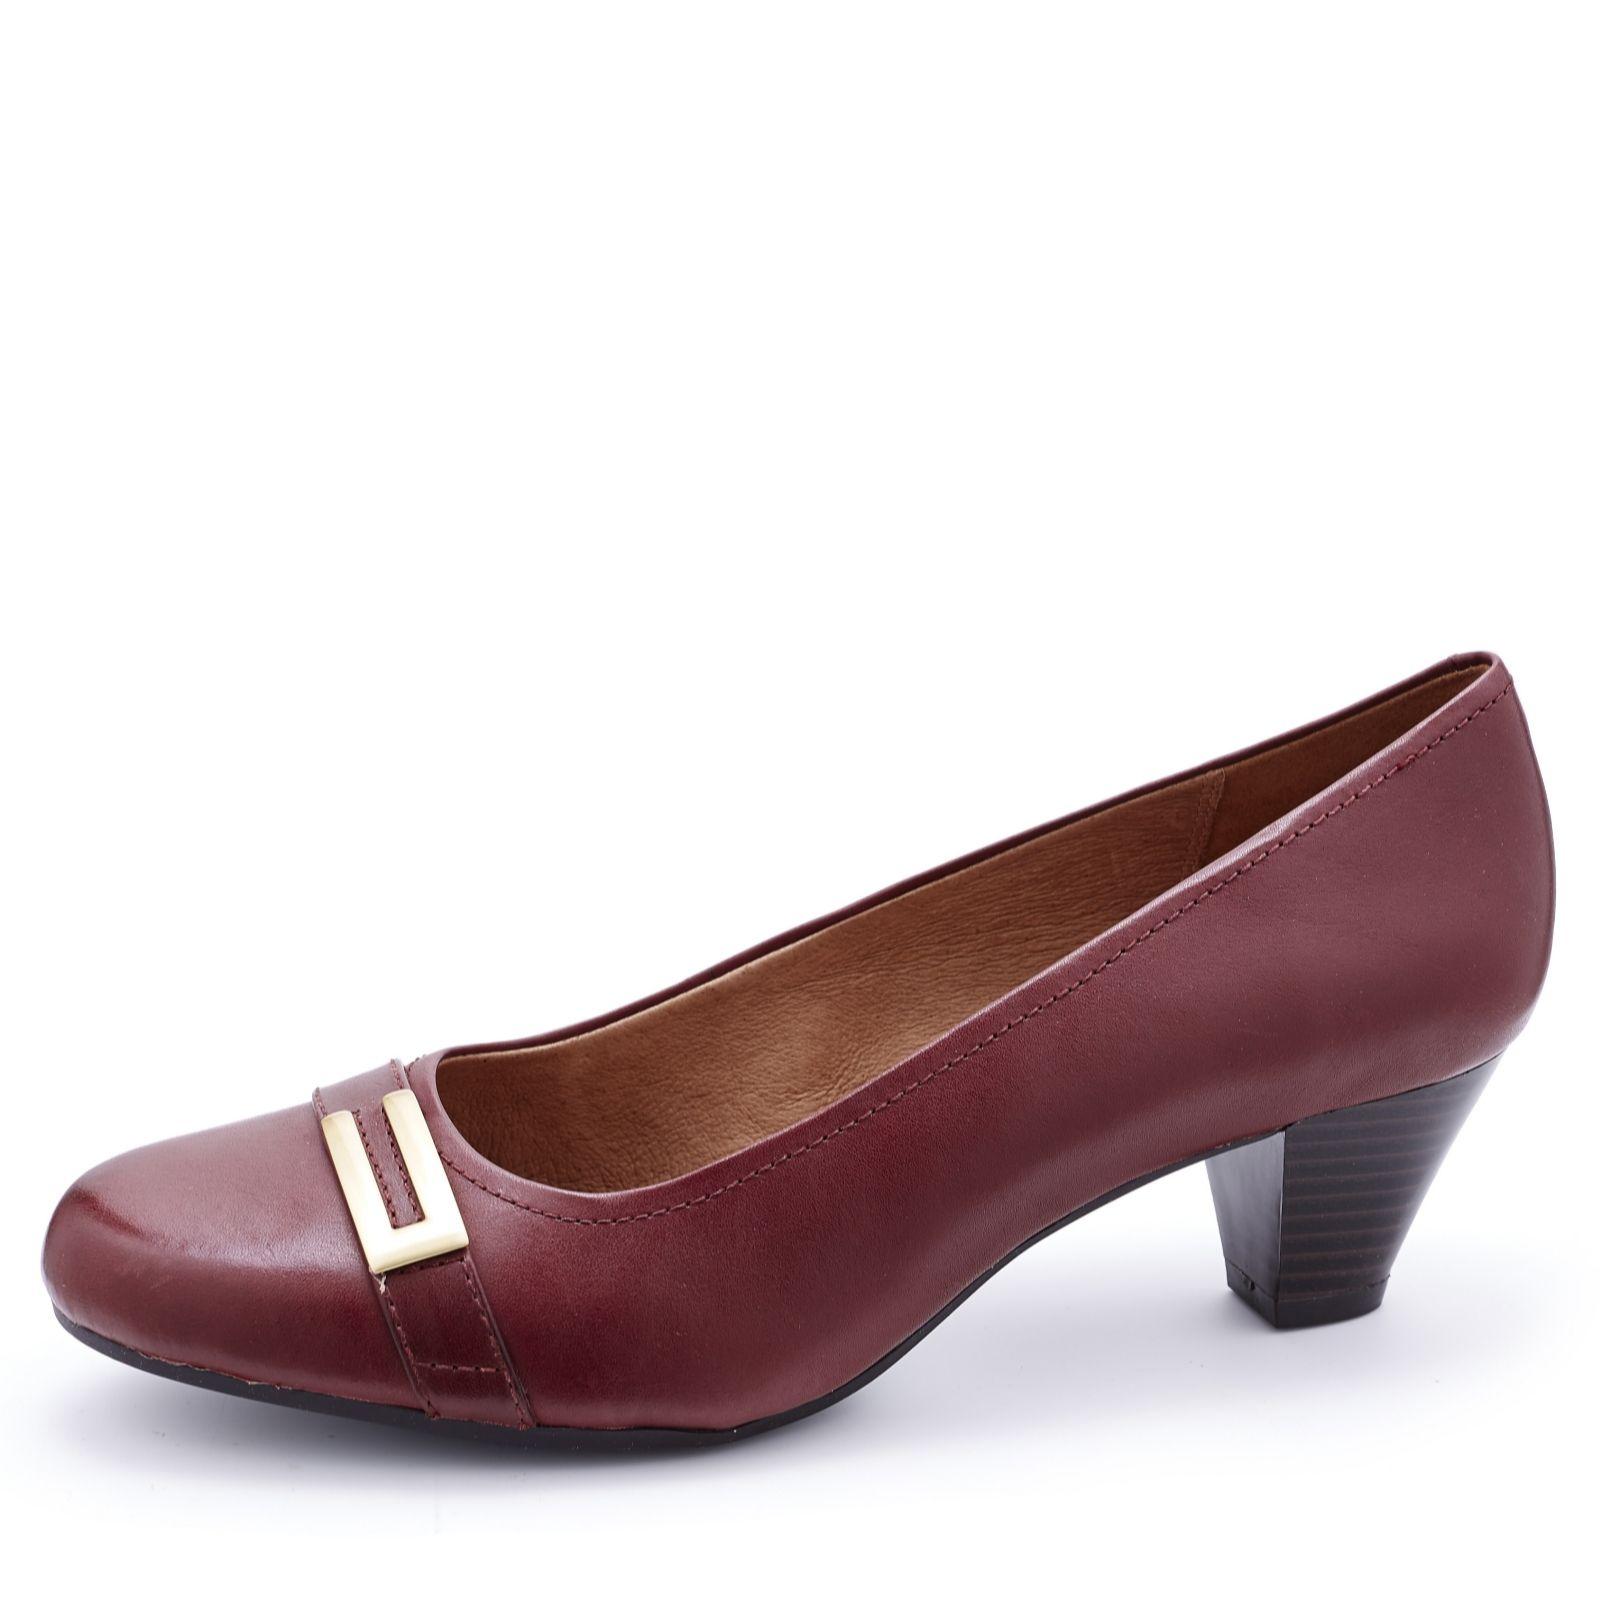 Wide fit sandals shoes uk - Clarks Fearne Shine Court Shoe Wide Fit 158247